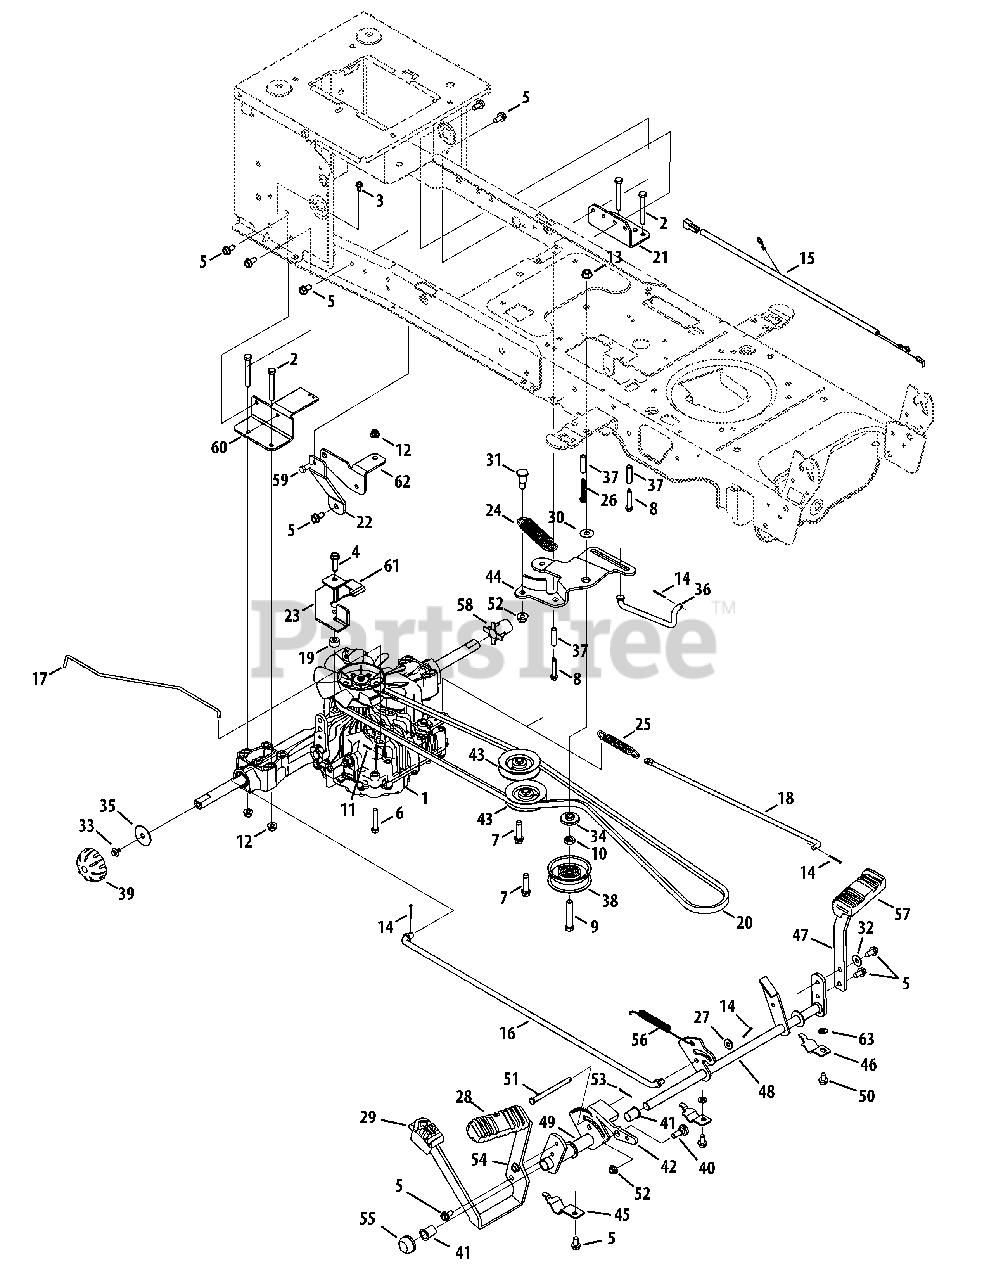 Cub Cadet Parts on the Drive System (Tuff Torq) Diagram